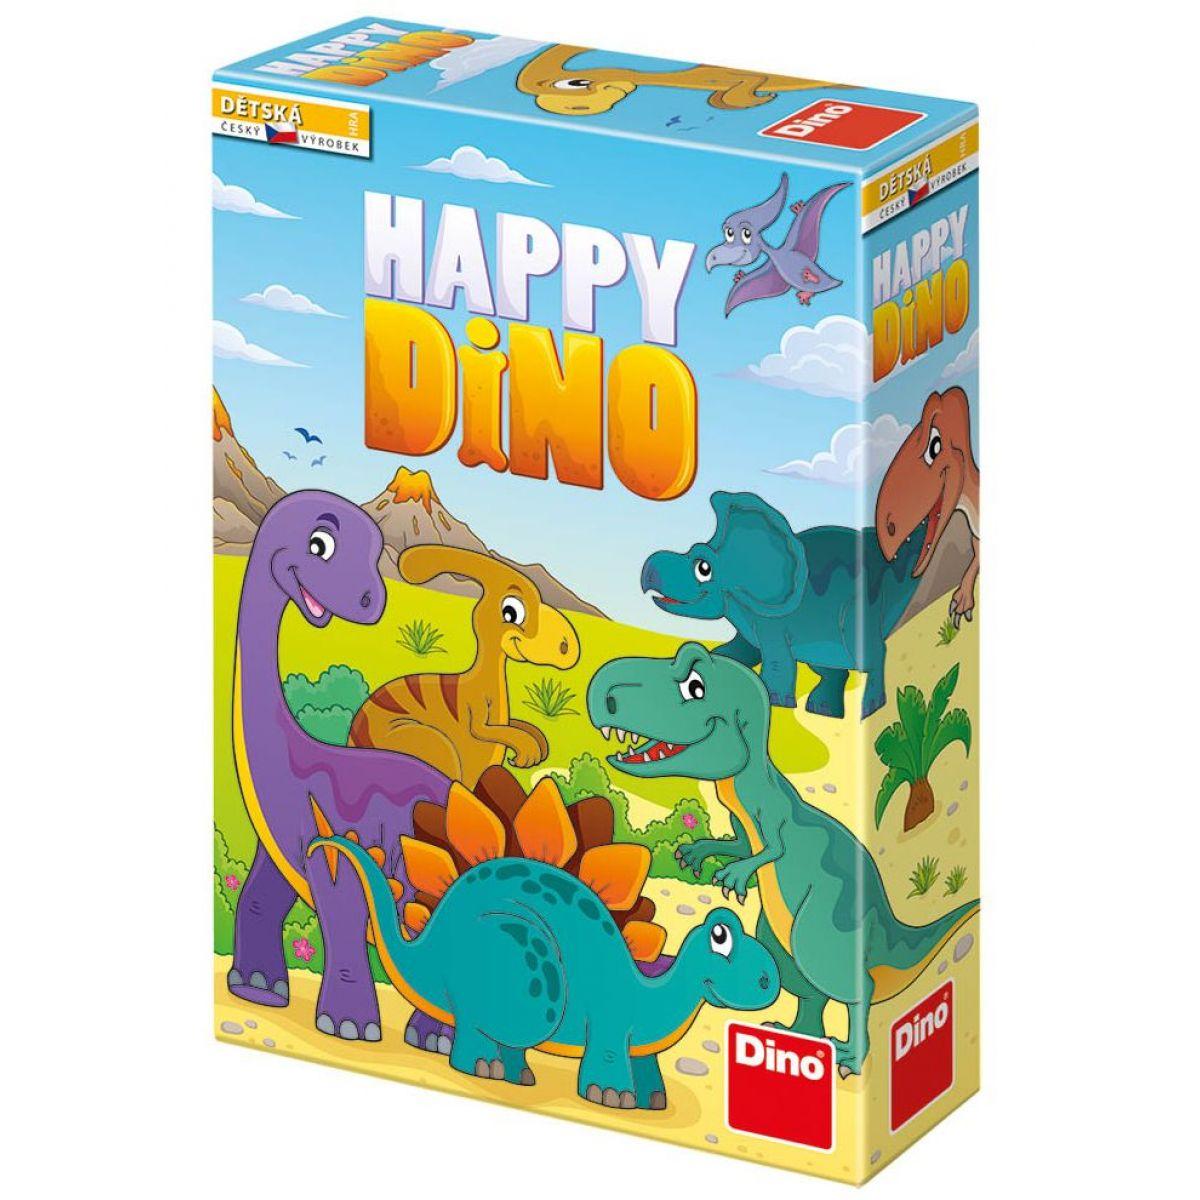 Dino Happy Dino